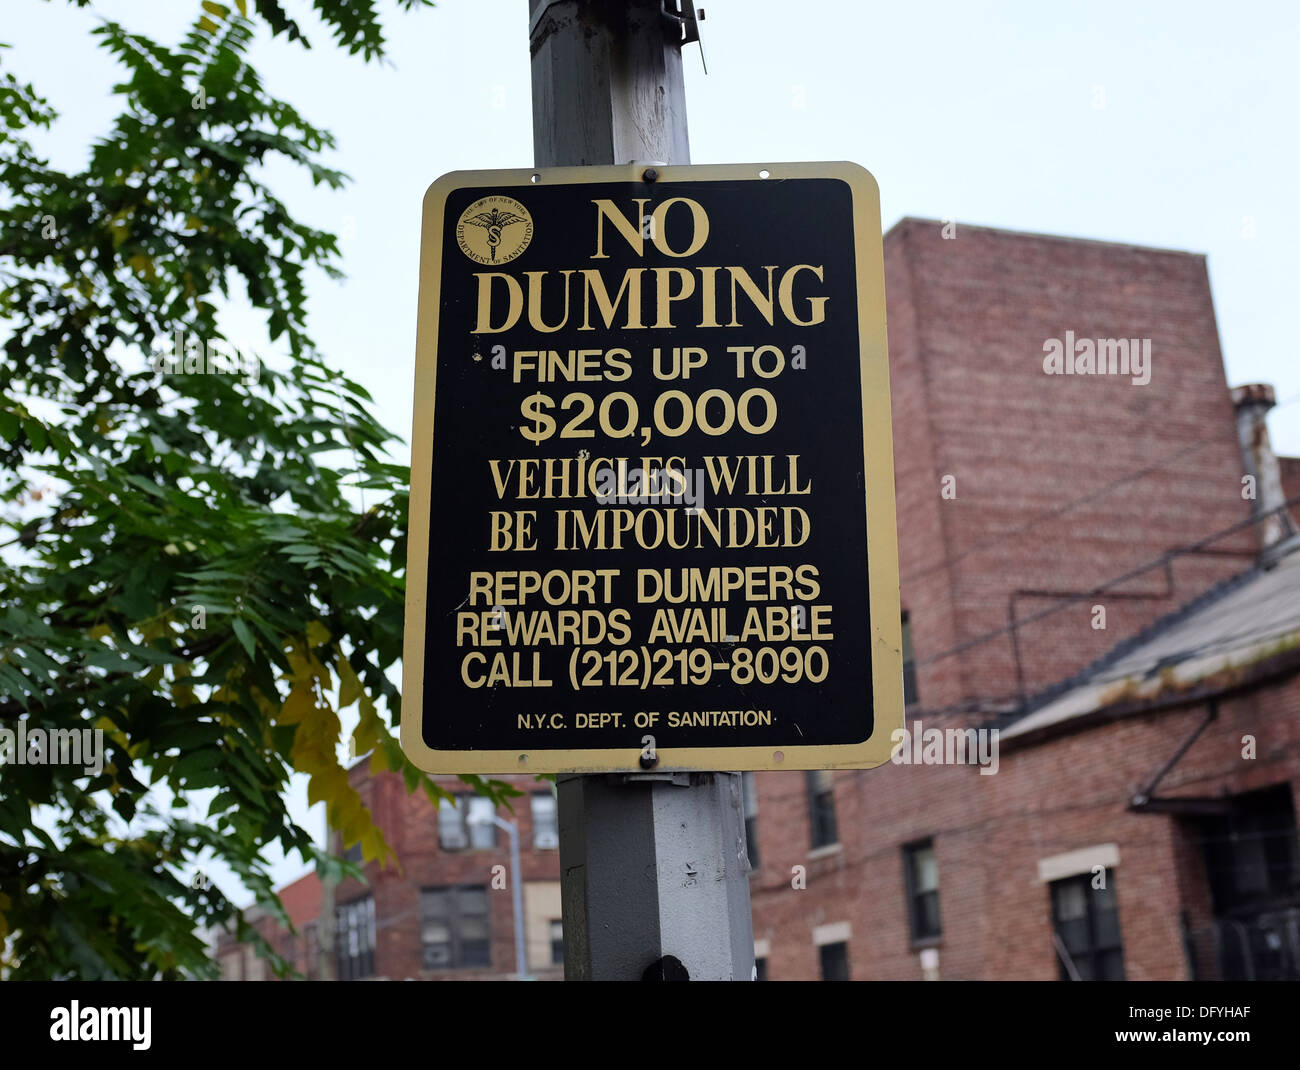 New York Department of Sanitation 'No Dumping' sign, Brooklyn, New York - Stock Image